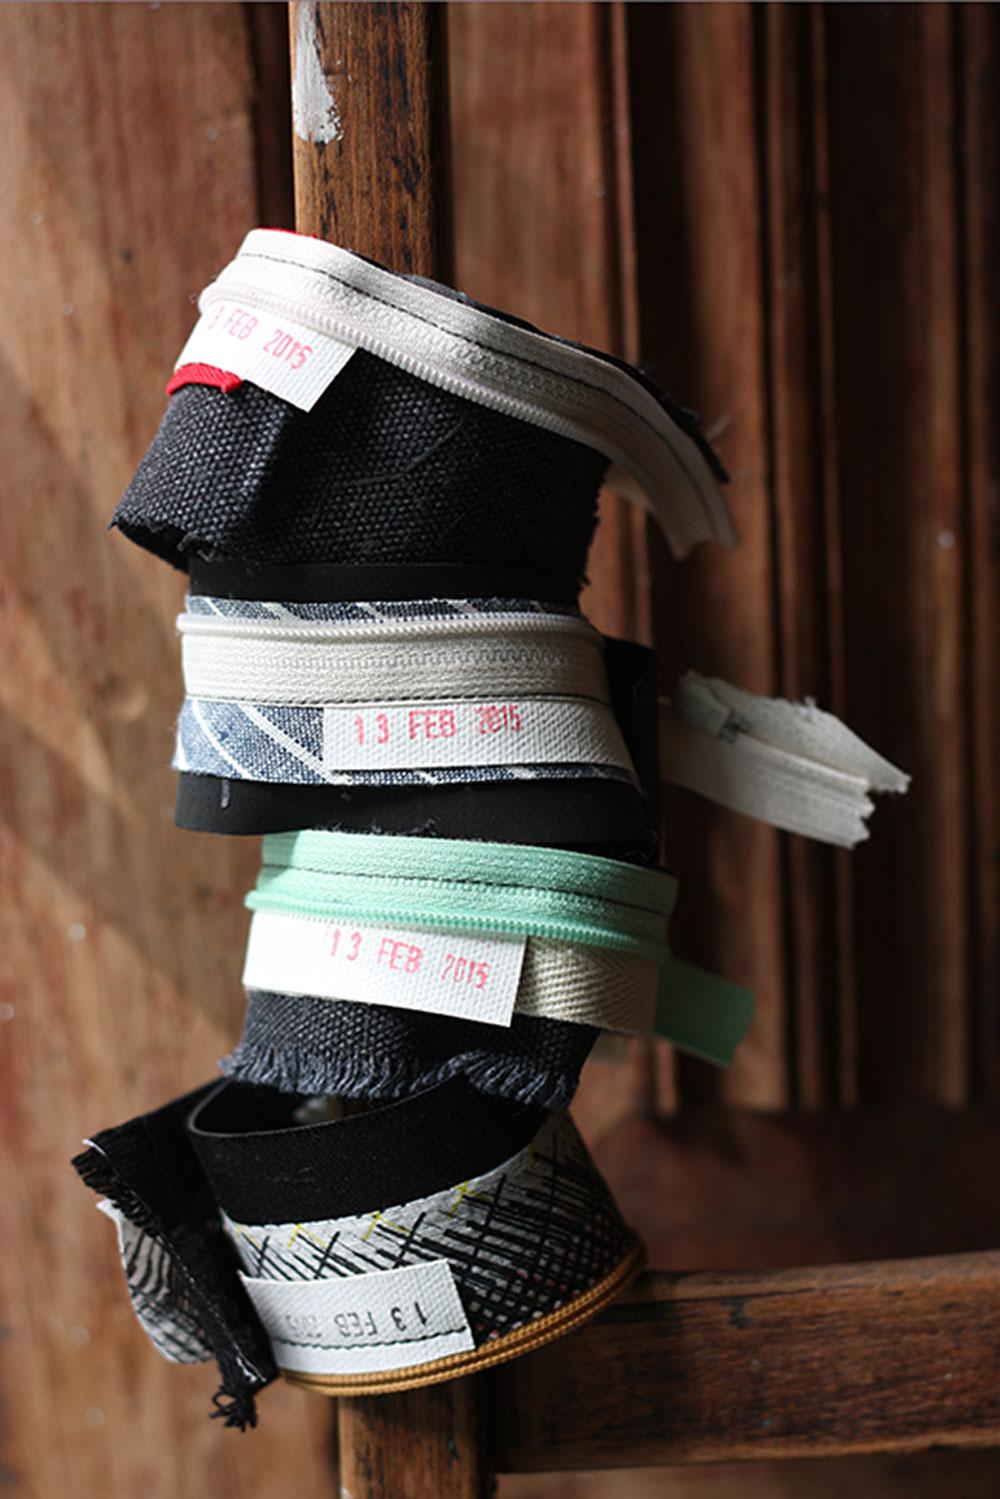 Rita & Frida. שאריות הסטודיות נוצלו לעיצוב אובייקטים לגוף כצמידים